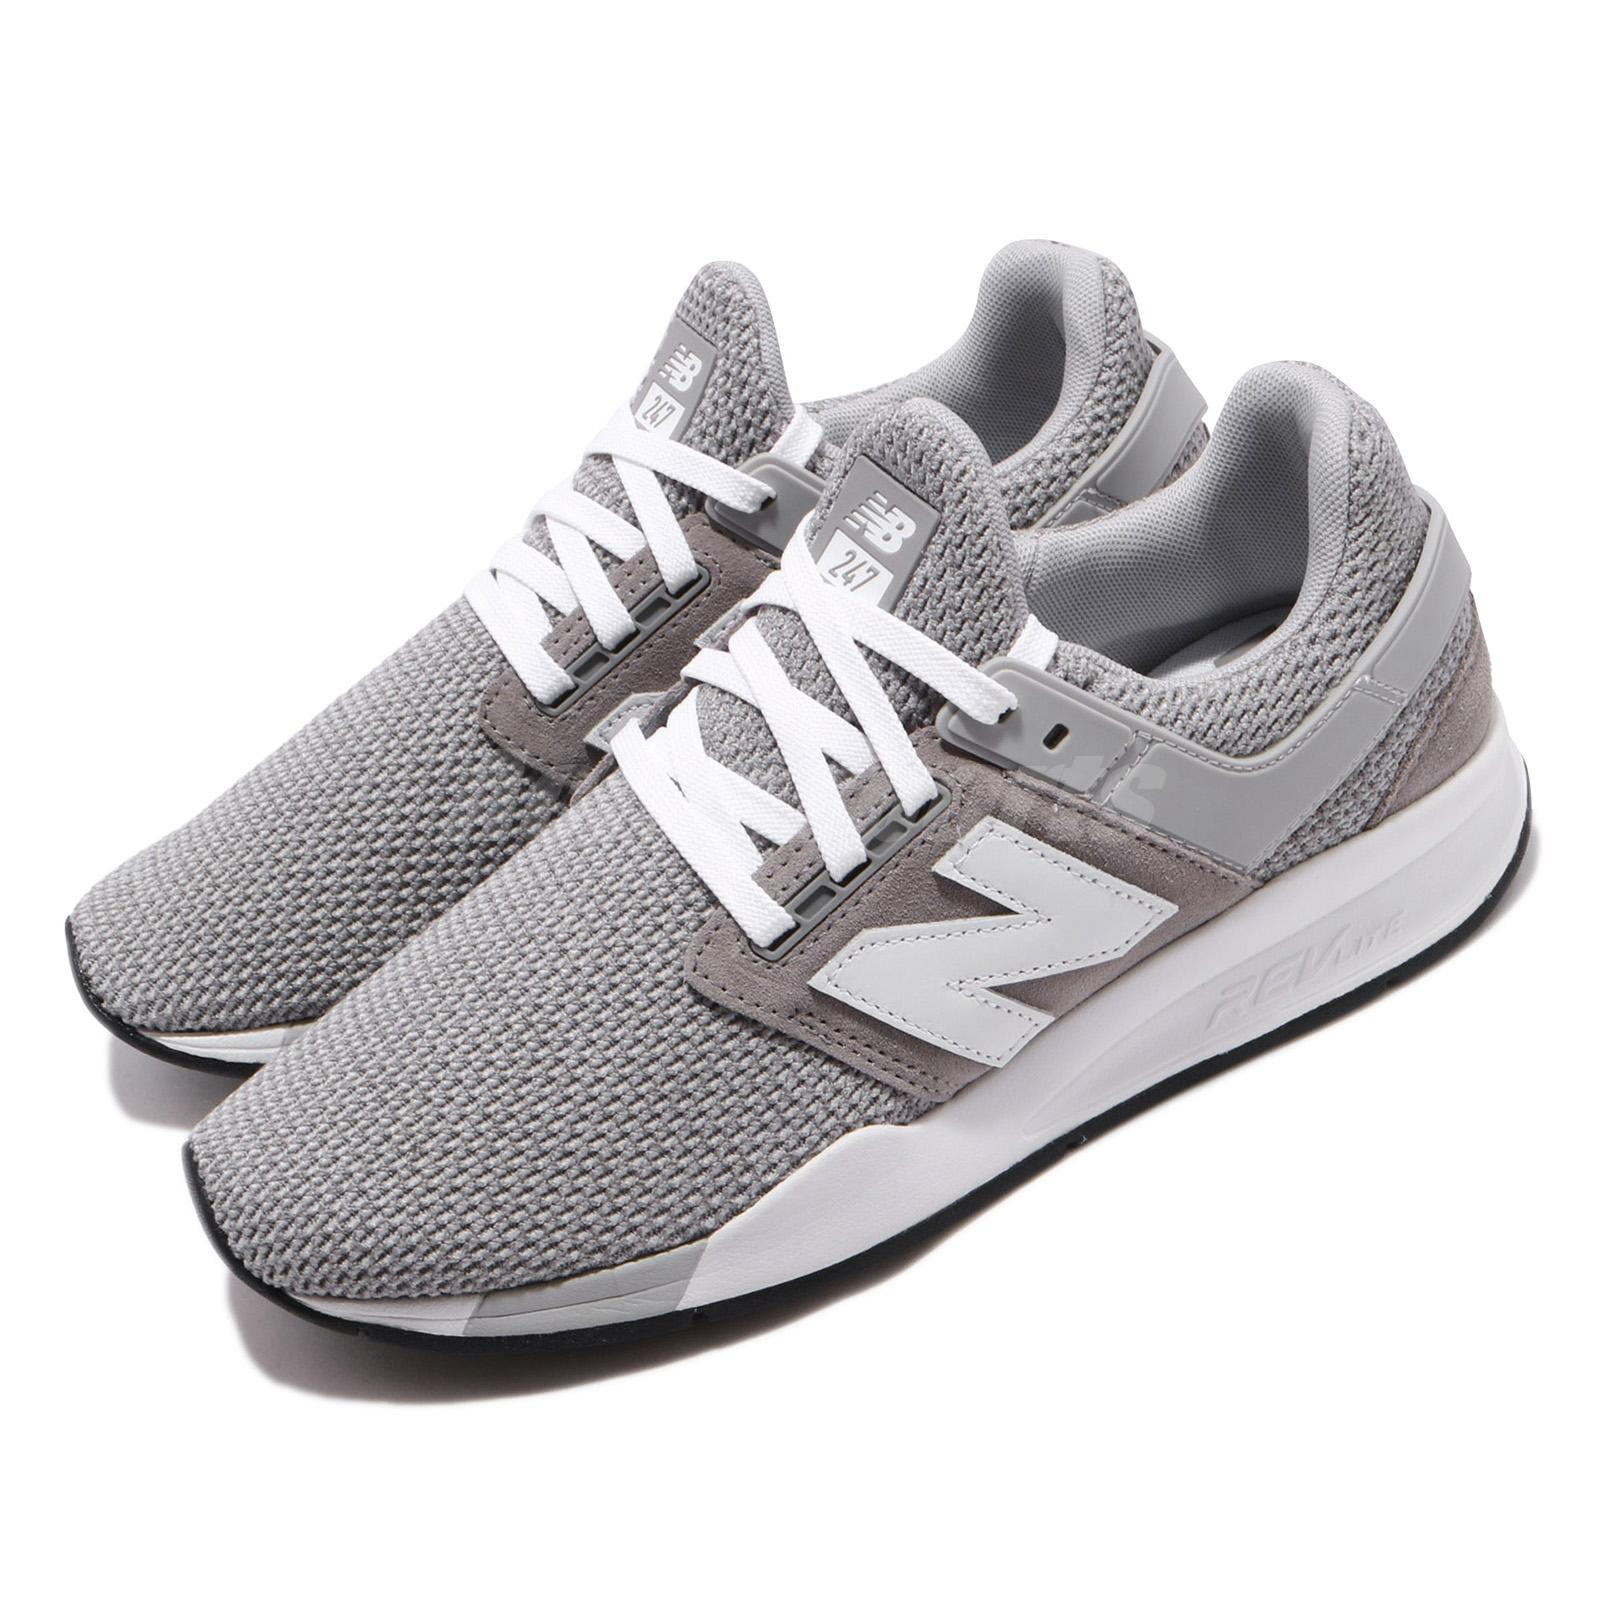 New Balance 247 D Grey White Mens